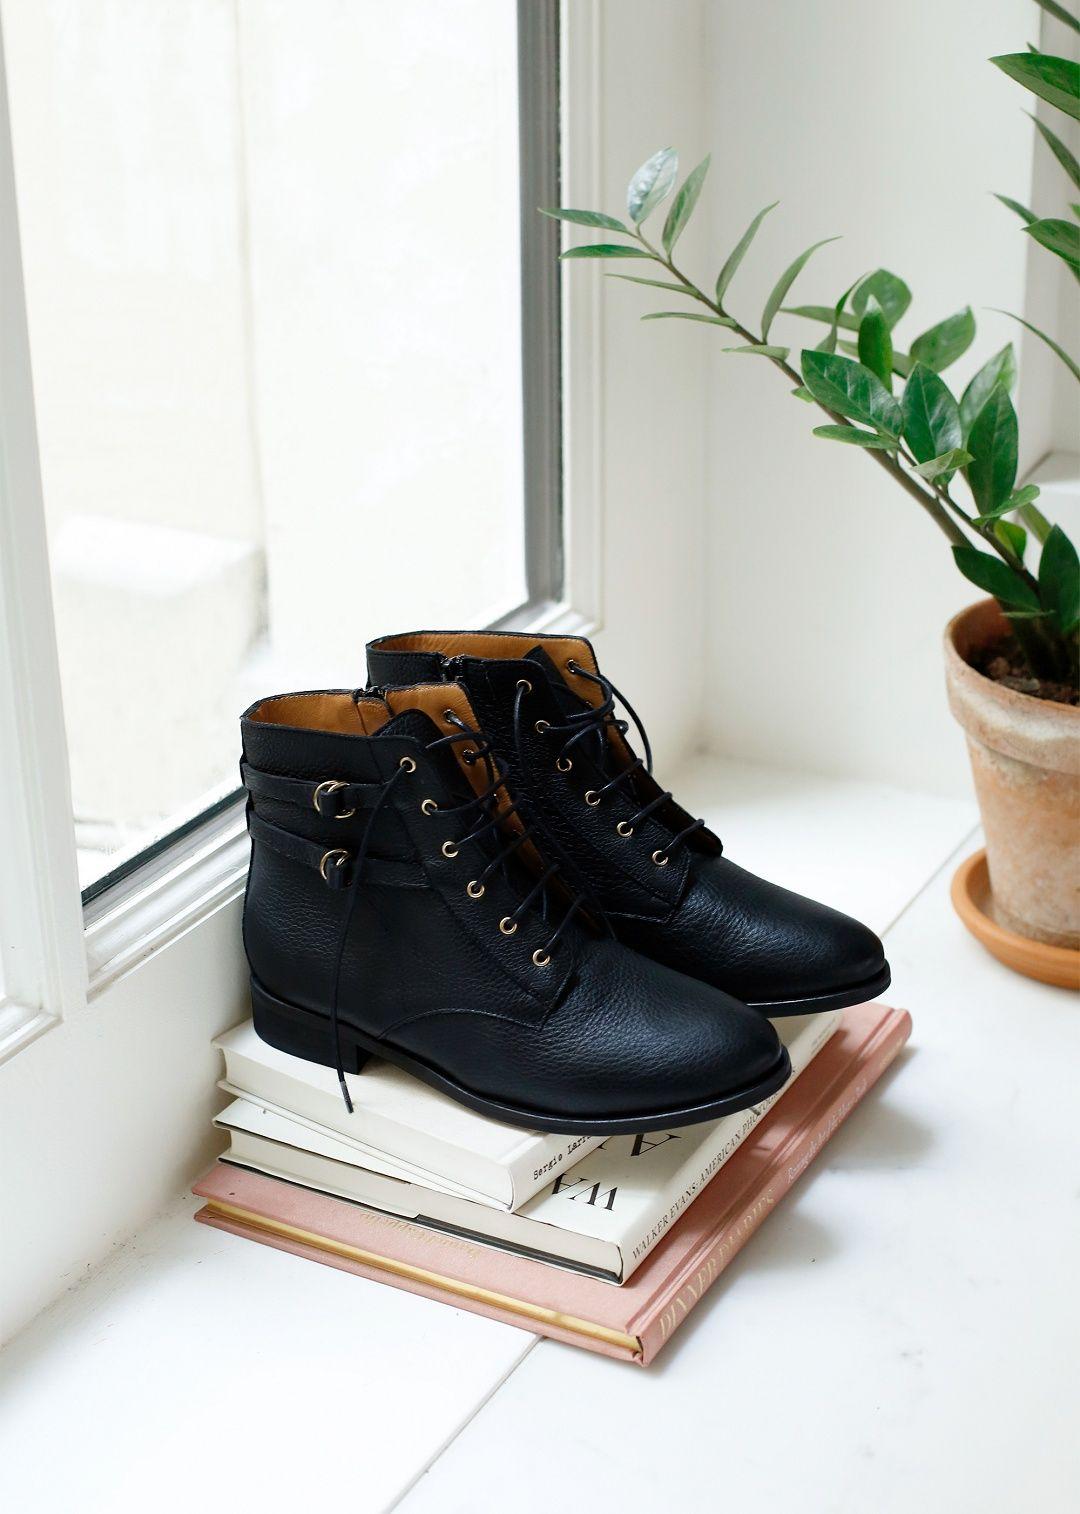 Sézane Bottines Low Solene   Chaussure hiver, Chaussure